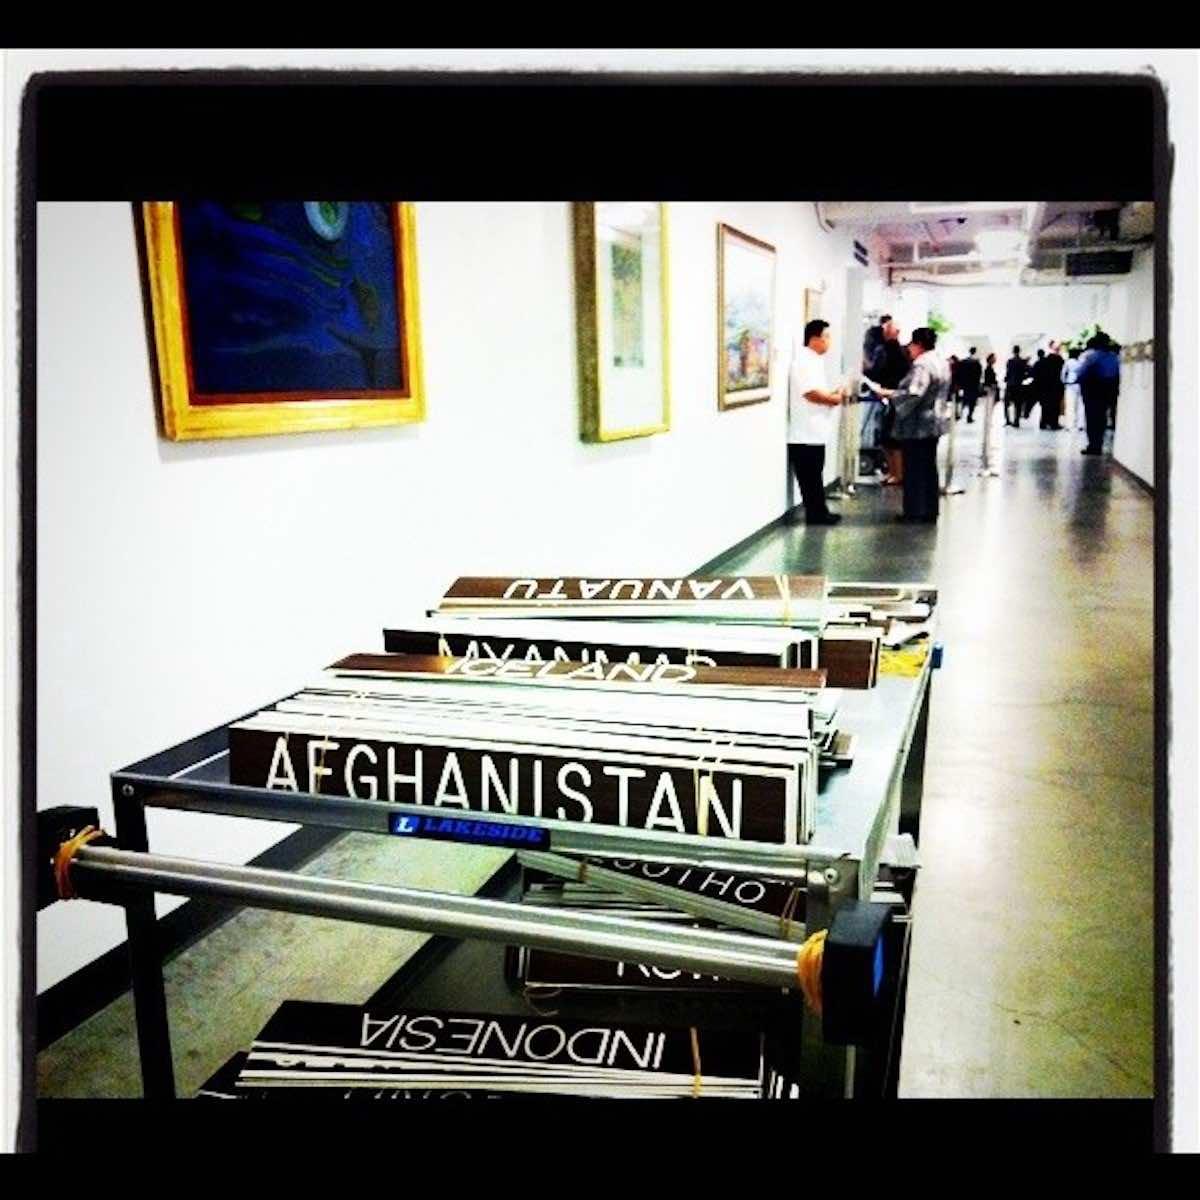 Member state name plates at UN Headquarters (John McIlwaine/UN Photo)